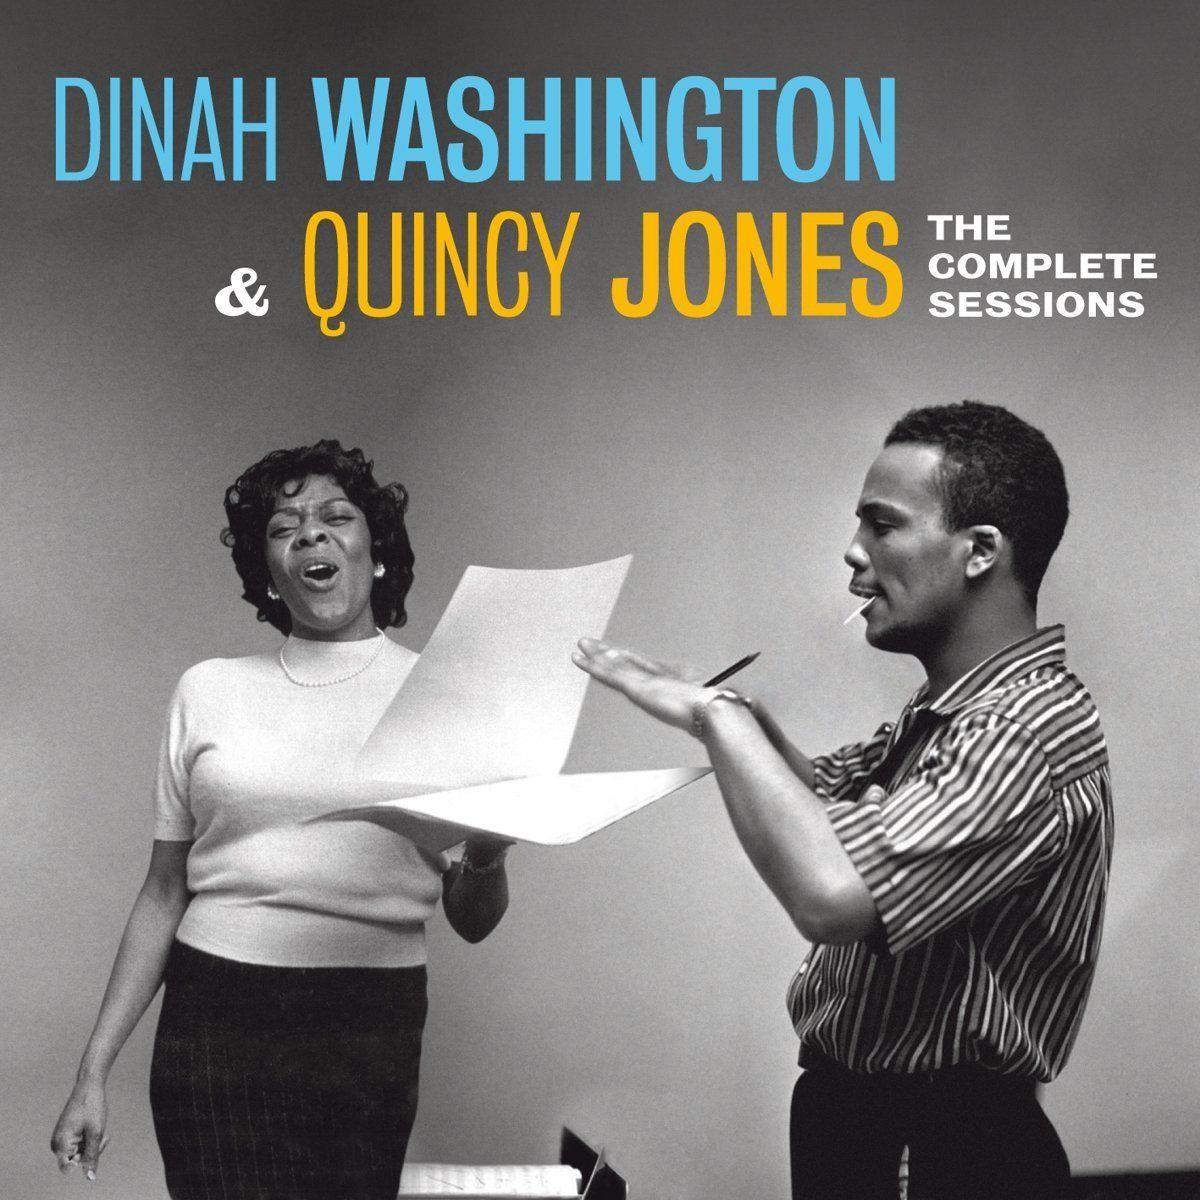 Dinah Washington & Quincy Jones The Complete Sessions